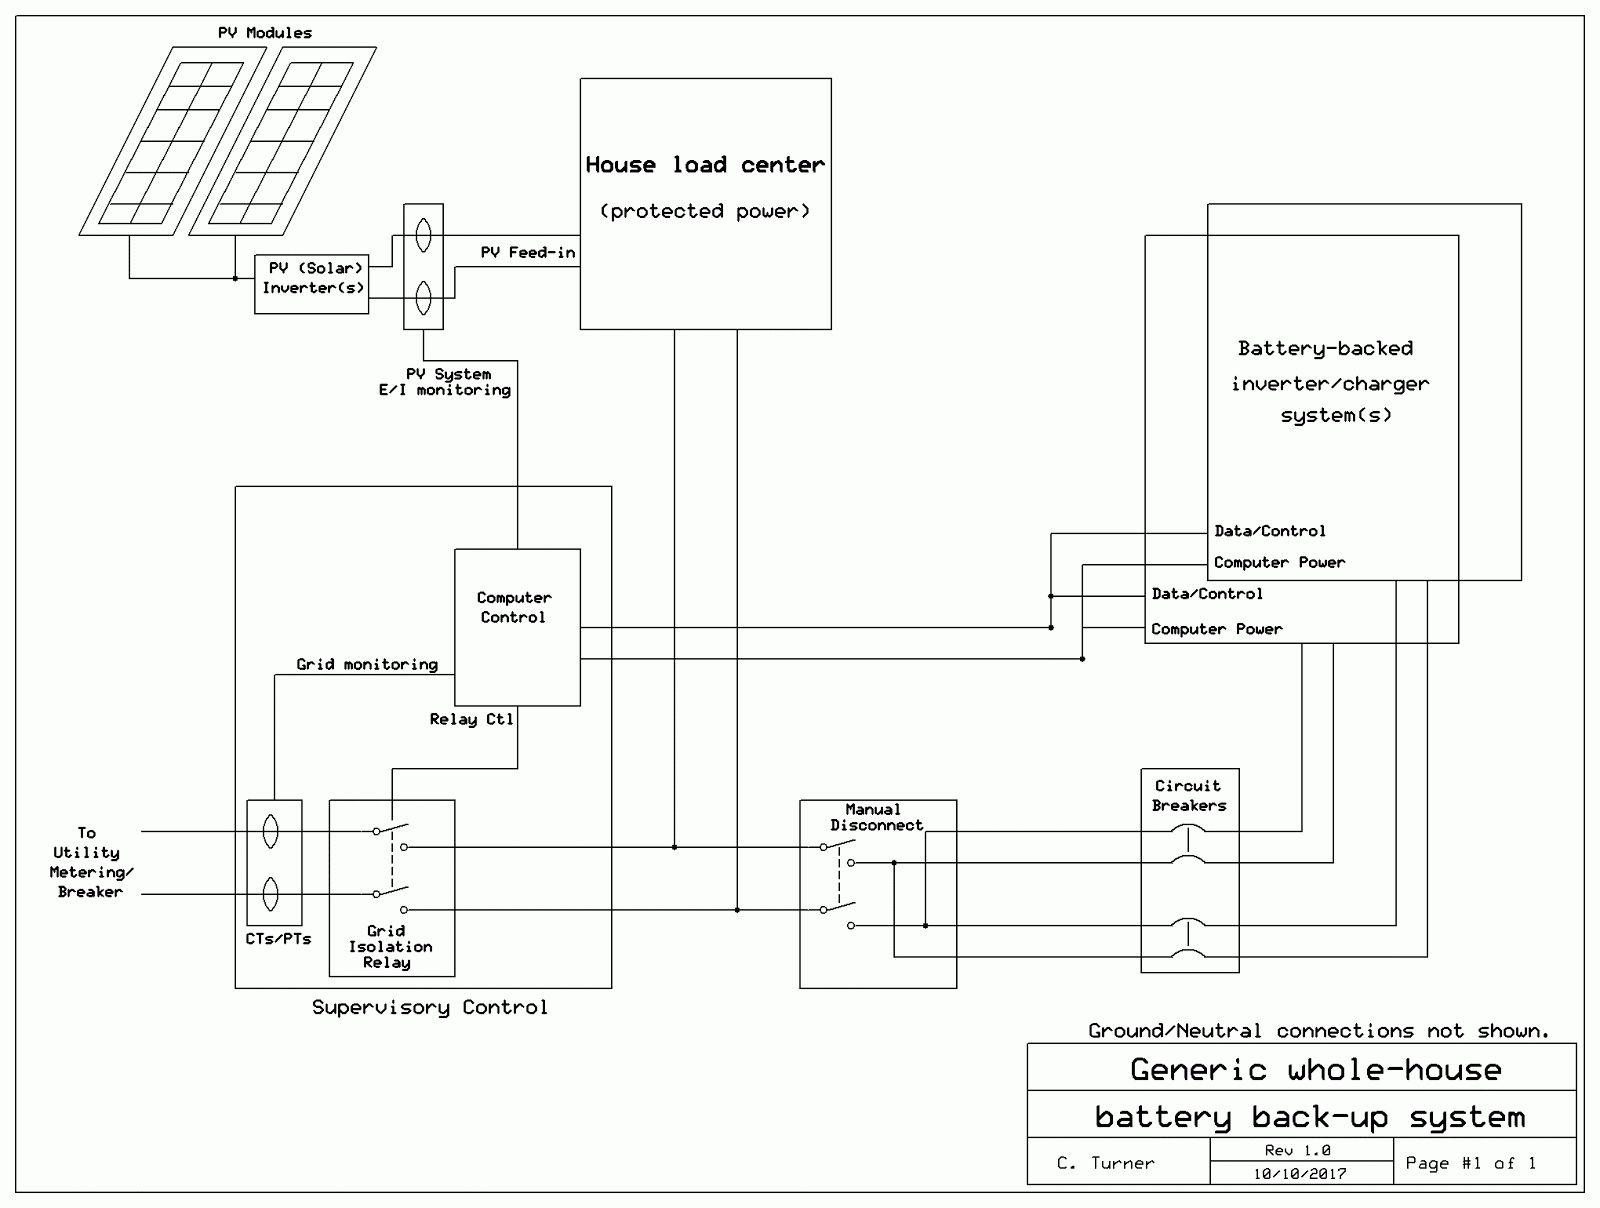 Tesla Battery Diagram Ka7Oei's Blog Does The Tesla Powerwall 2 - Tesla Powerwall 2 Wiring Diagram